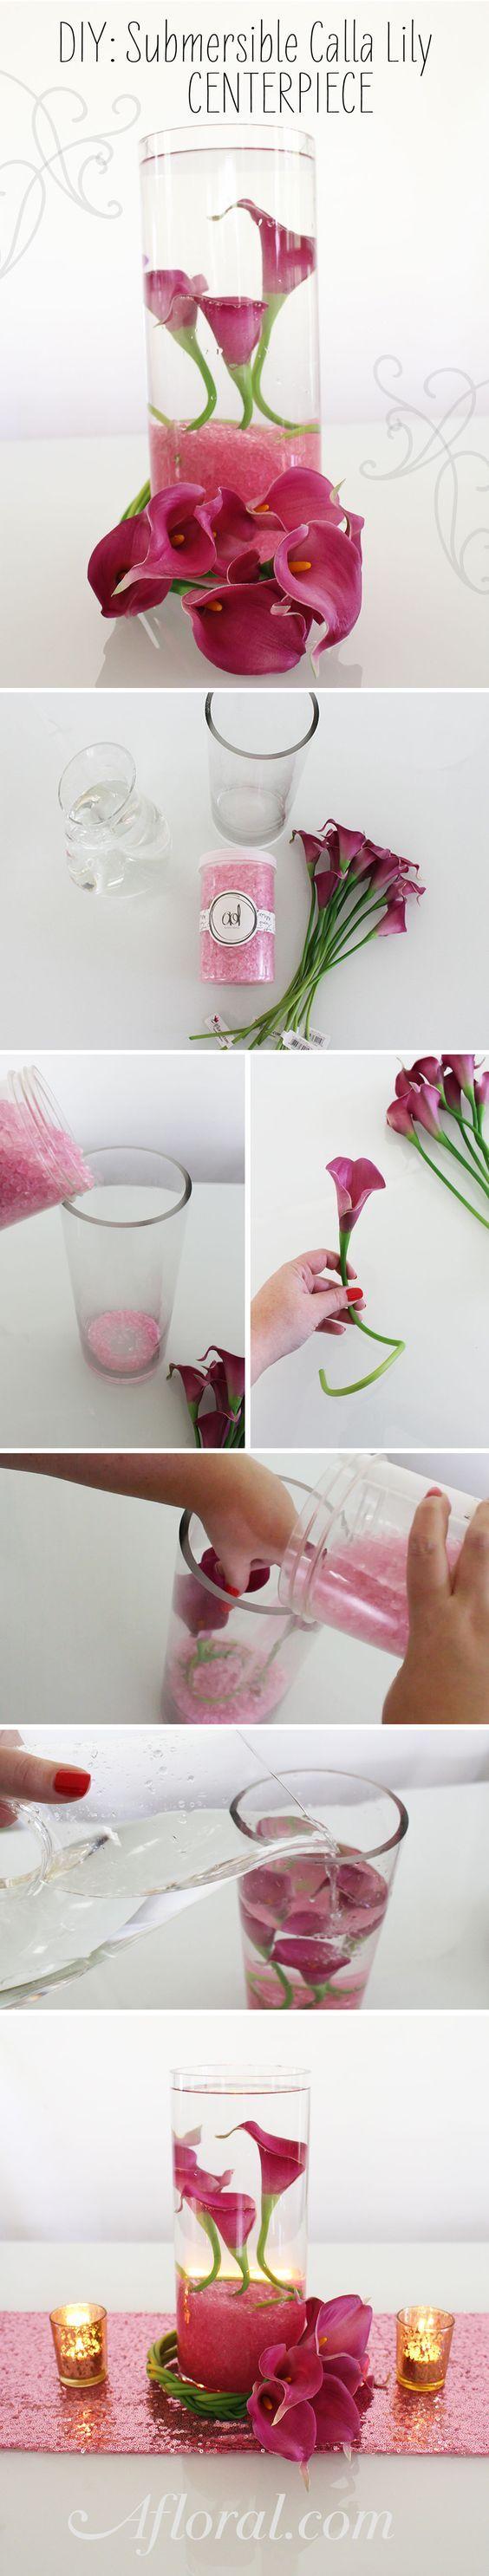 DIY Wedding Centerpiece Ideas / http://www.himisspuff.com/diy-wedding-centerpieces-on-a-budget/30/